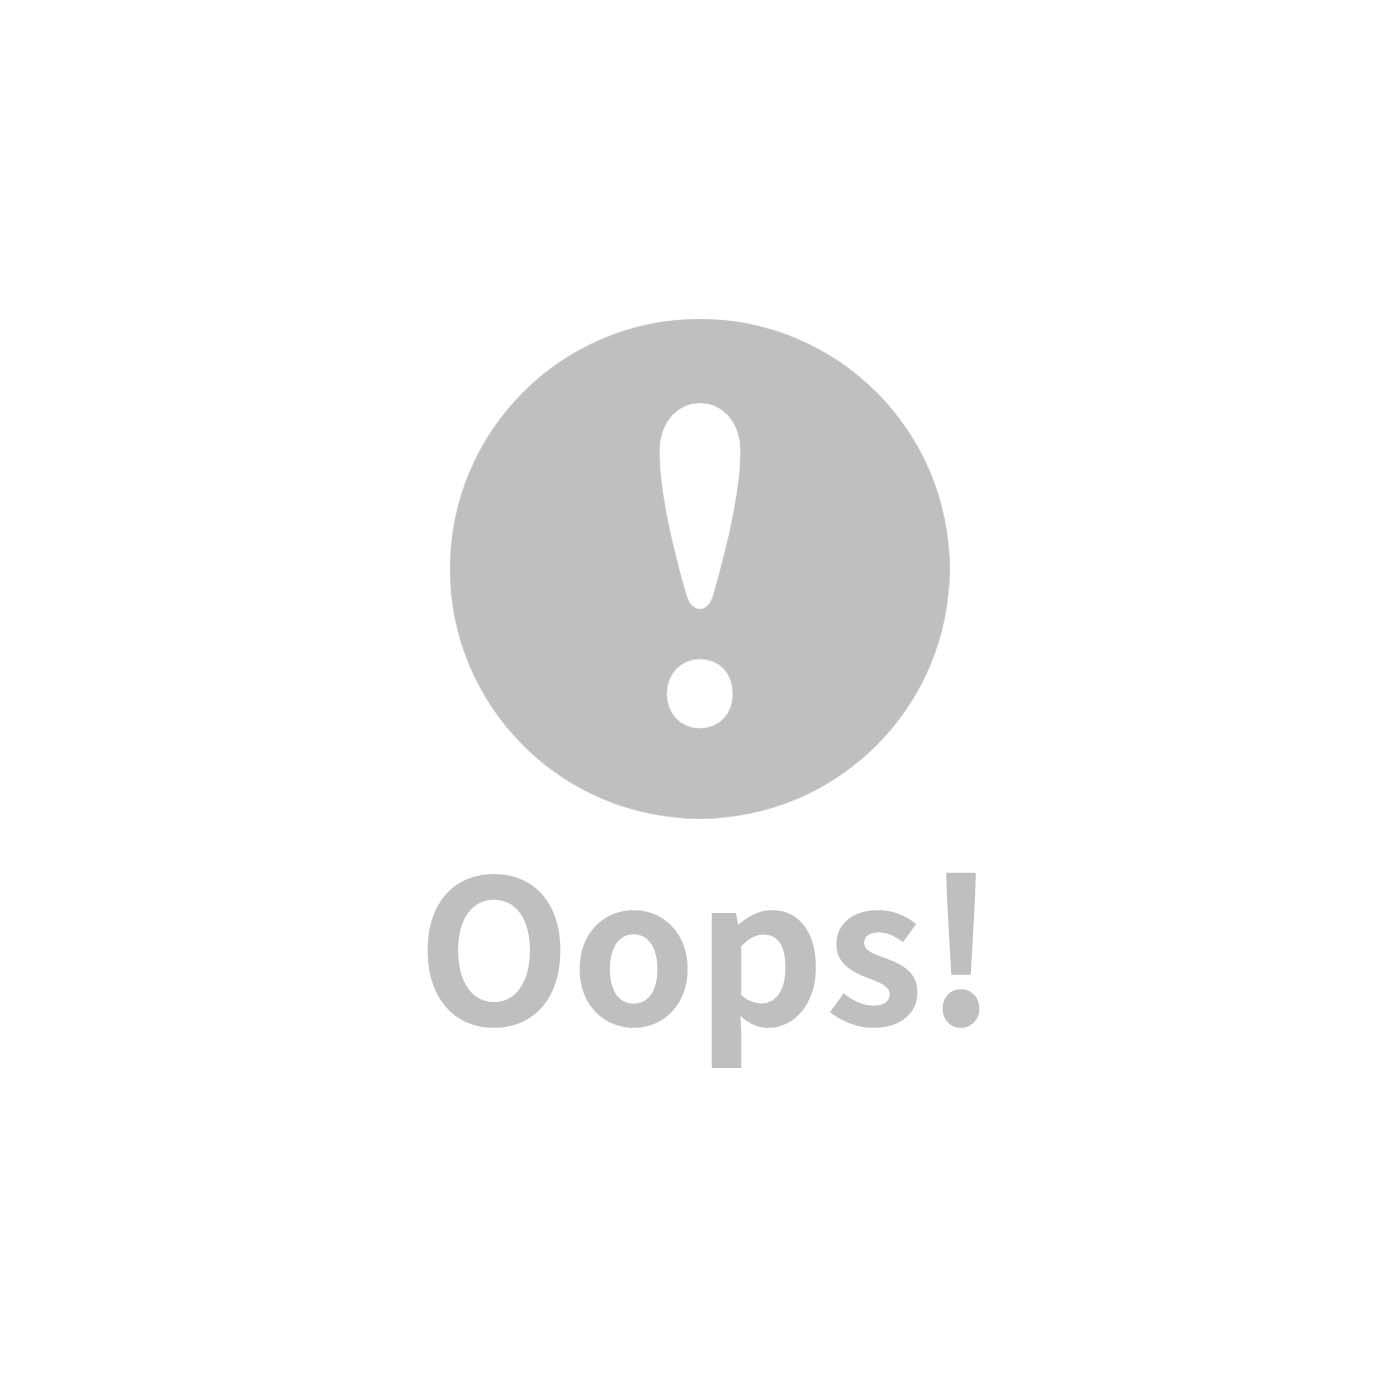 La Millou velvet頂級棉柔系列-雙面柔柔毯大人款-格格牡丹花(舒柔嫩粉)